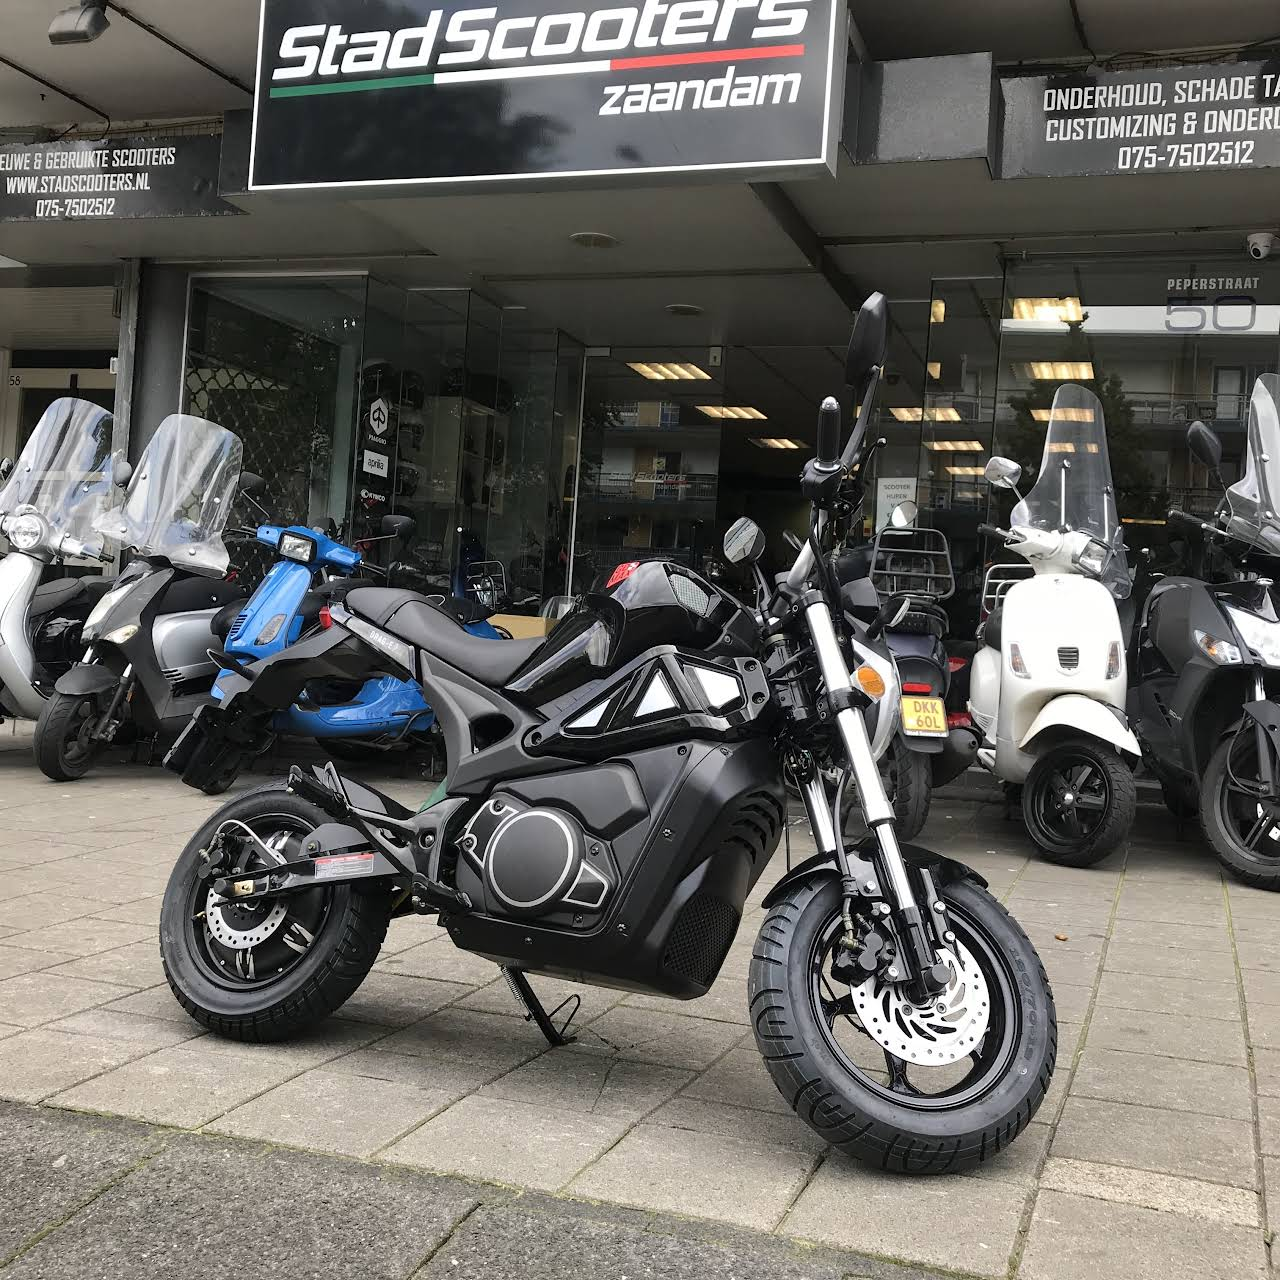 Betere Stadscooters Zaandam - Scooterwinkel in Zaandam NP-87